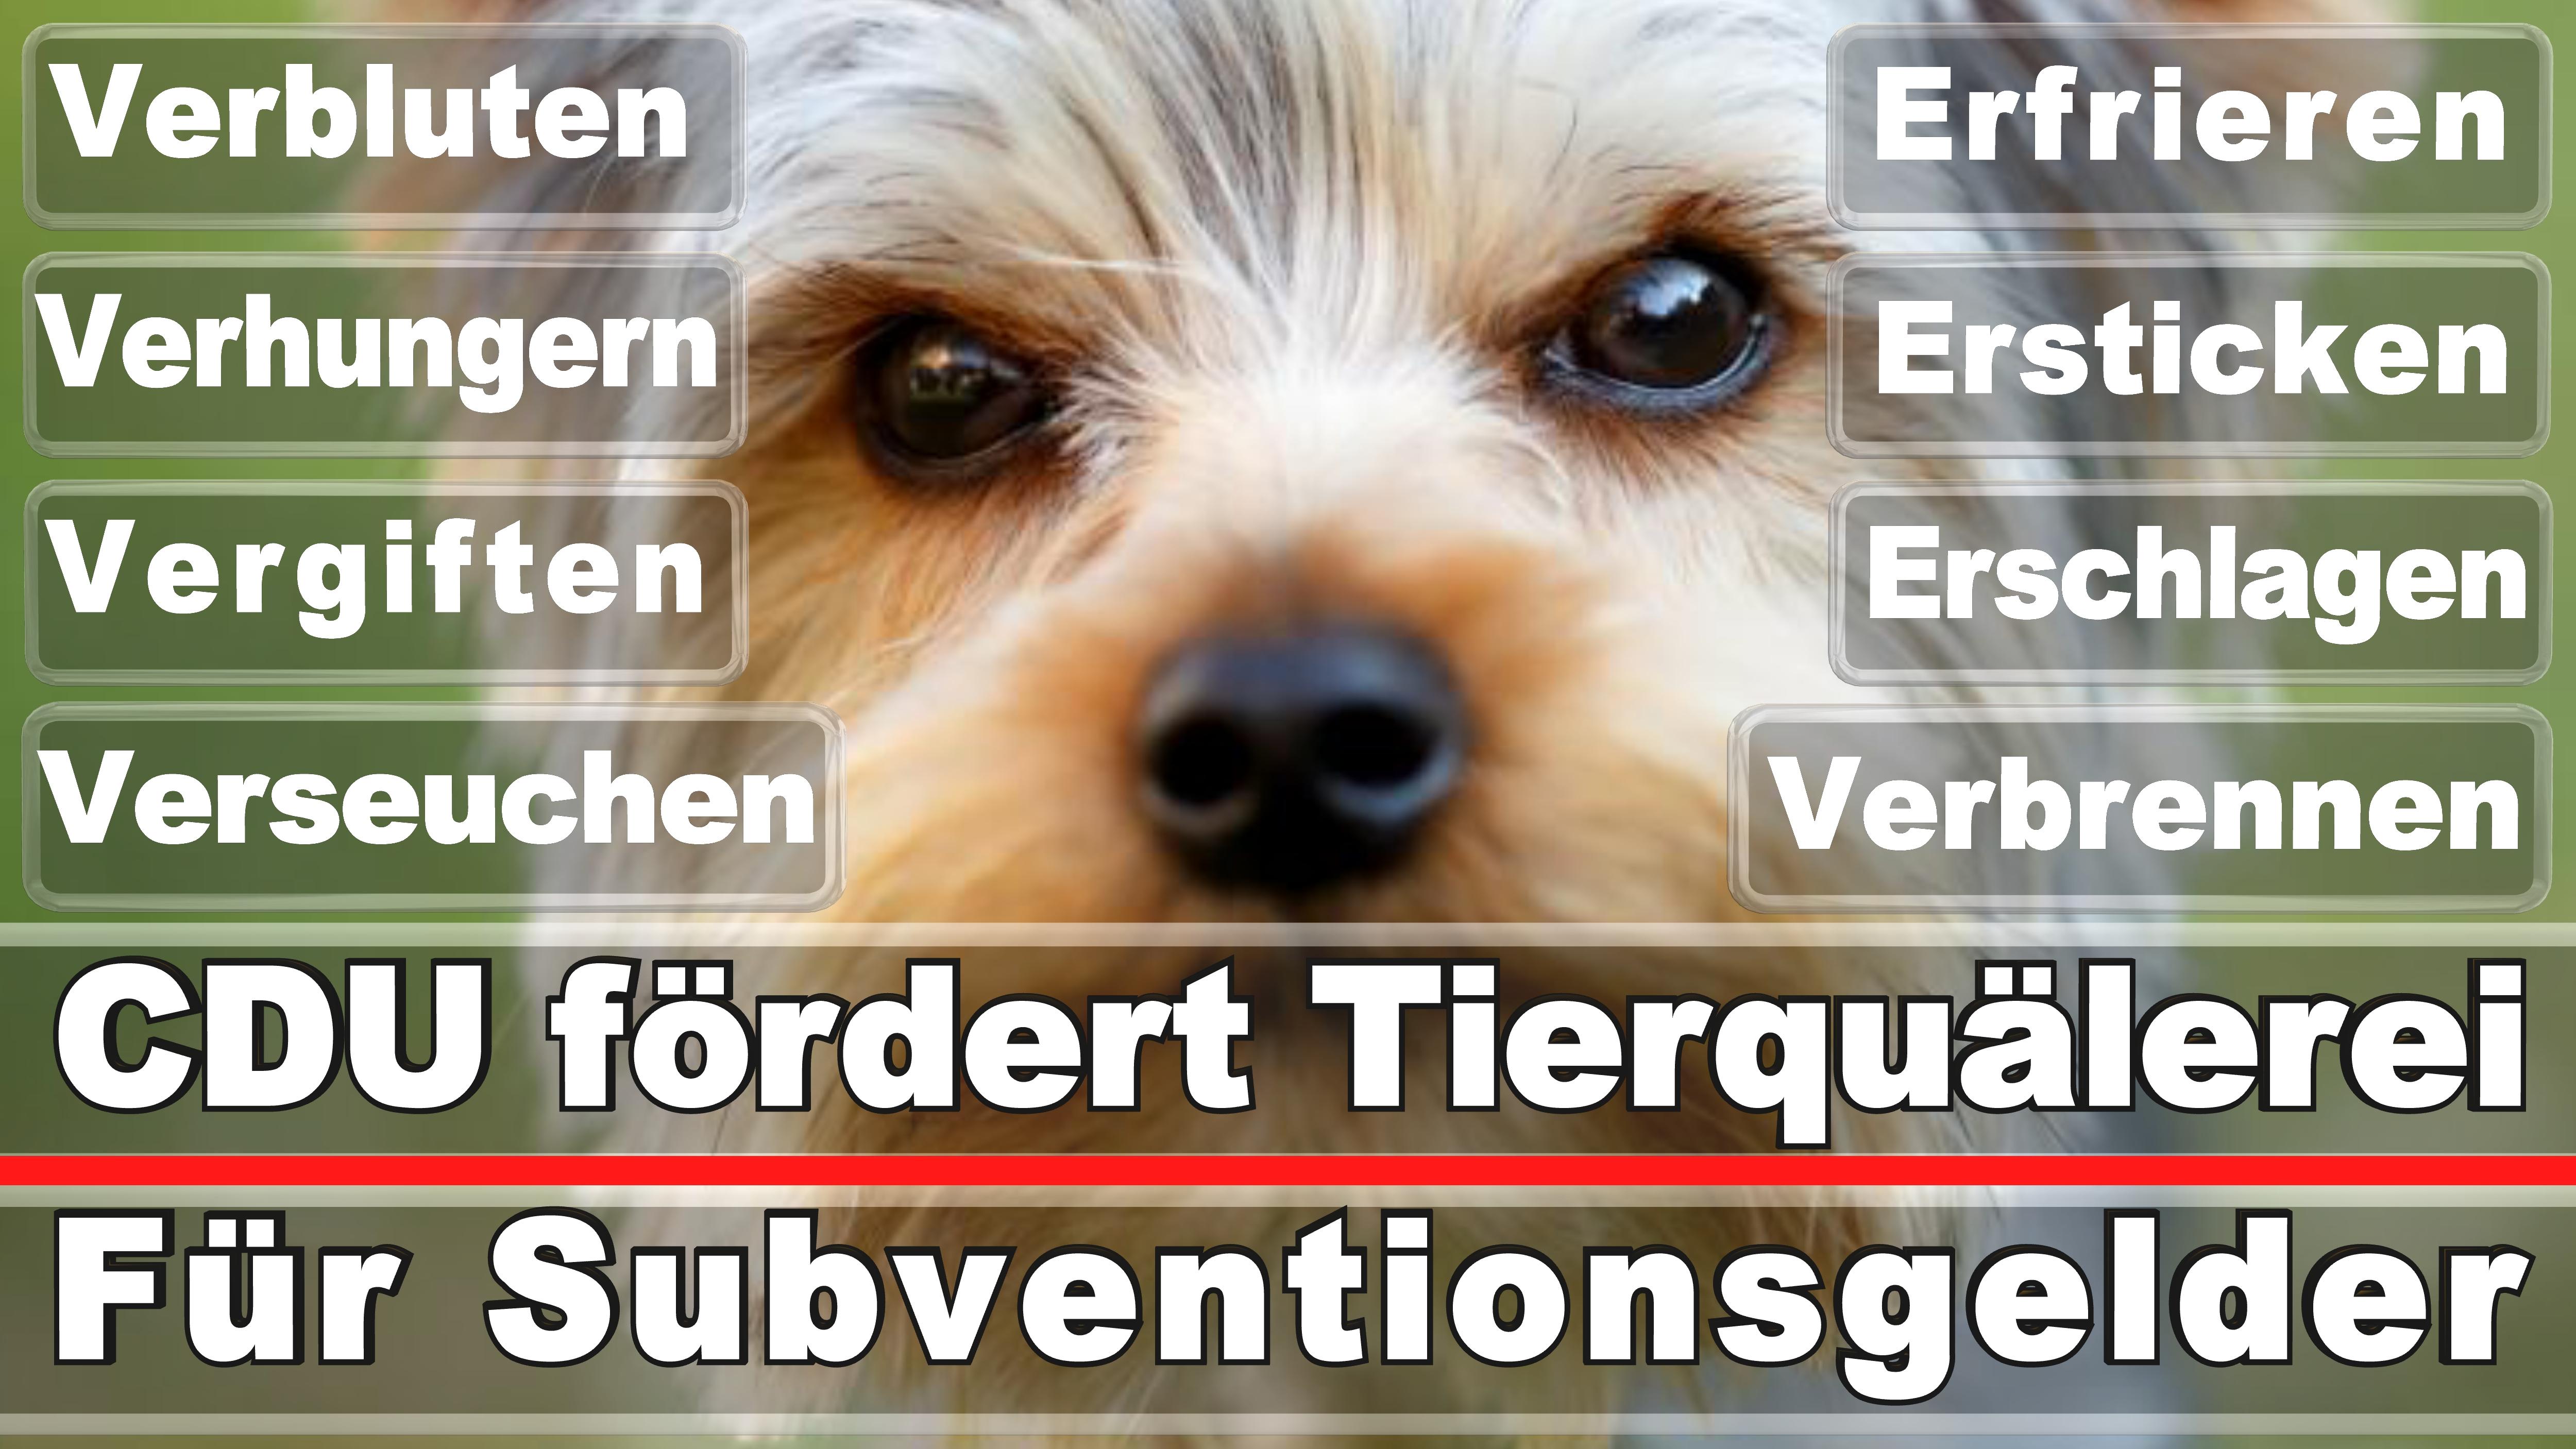 Landtagswahl-Bundestagswahl-CDU-SPD-FDP-AFD-Linke-Piraten-Tierschutzpartei (28)